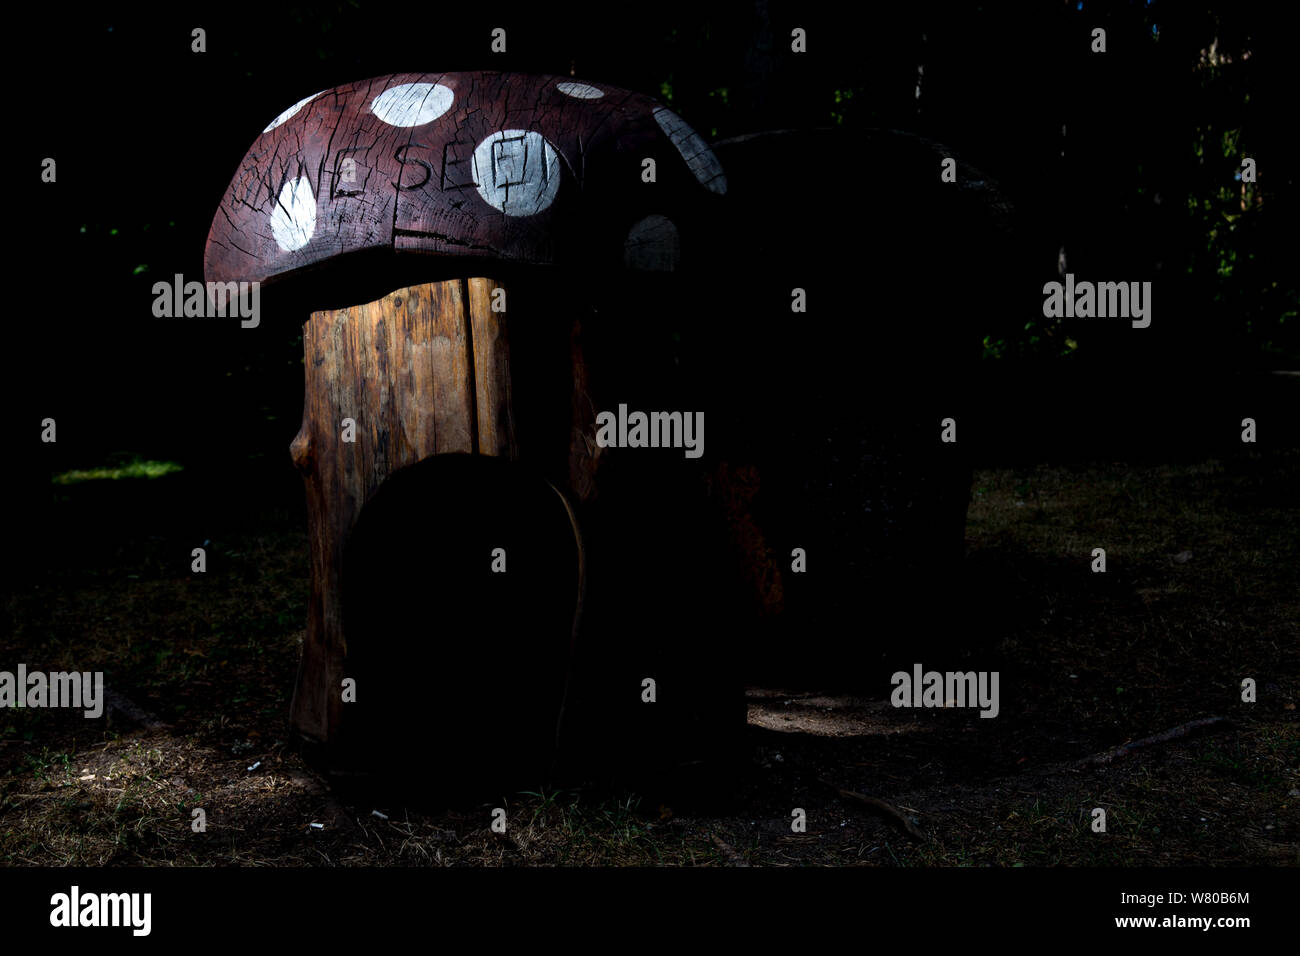 Wooden mushroom at night Stock Photo